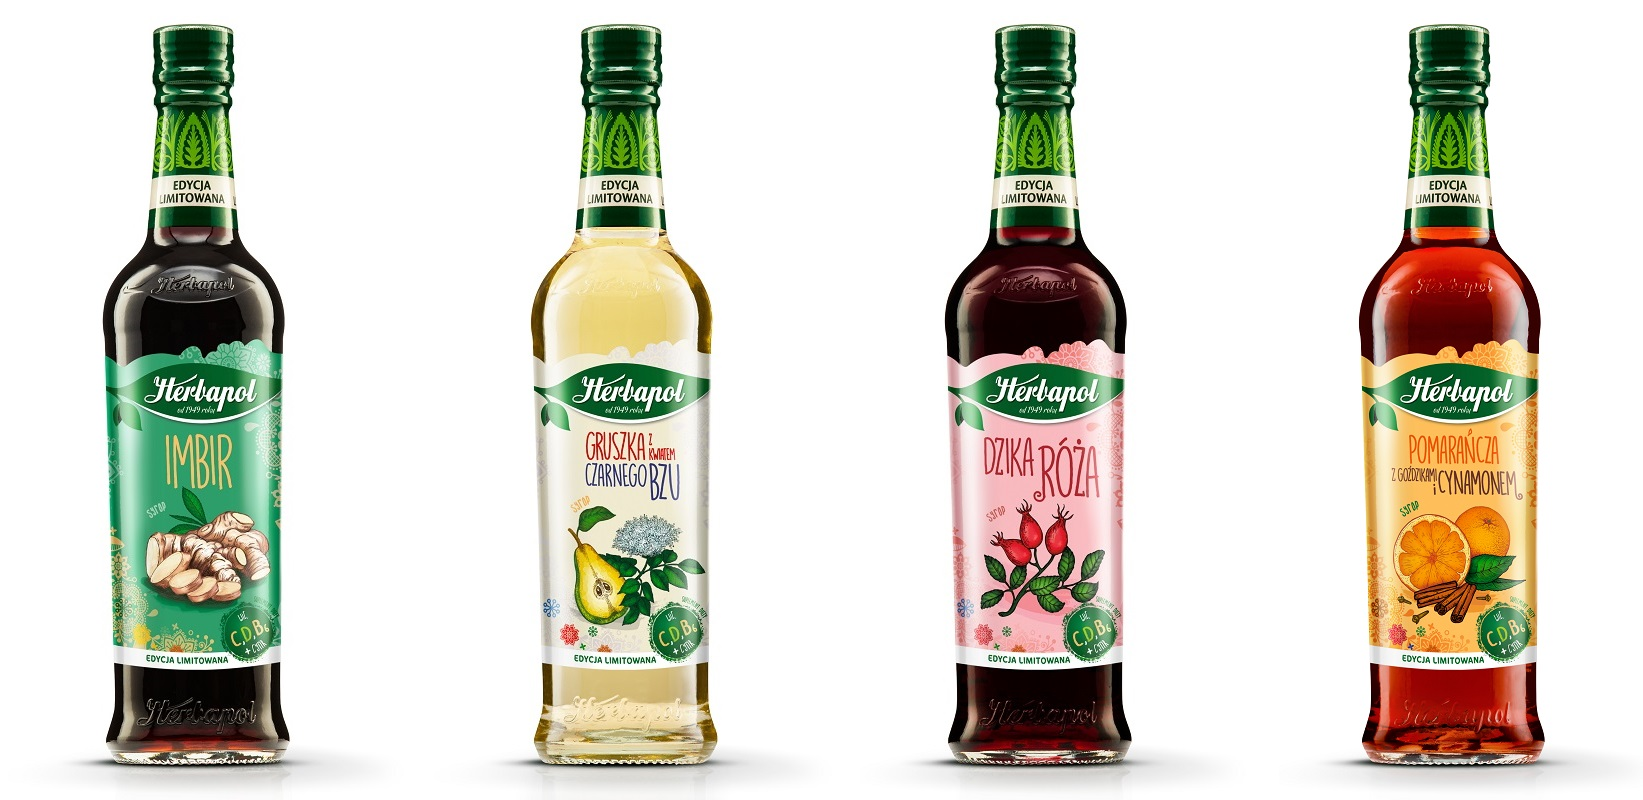 Syropy sezonowe od marki Herbapol